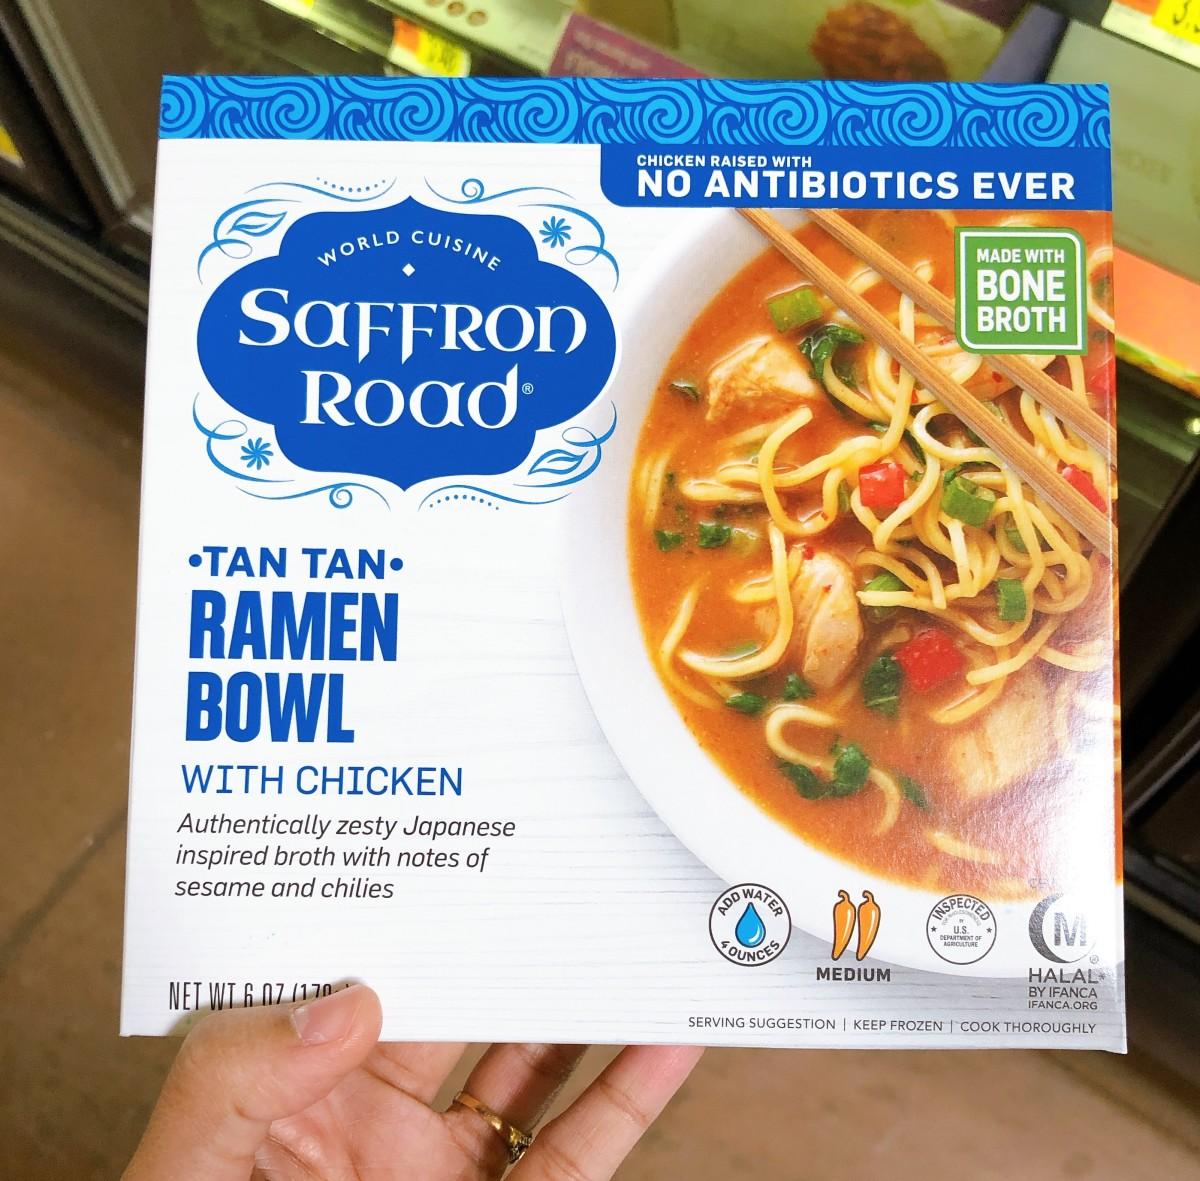 The ramen bowl.